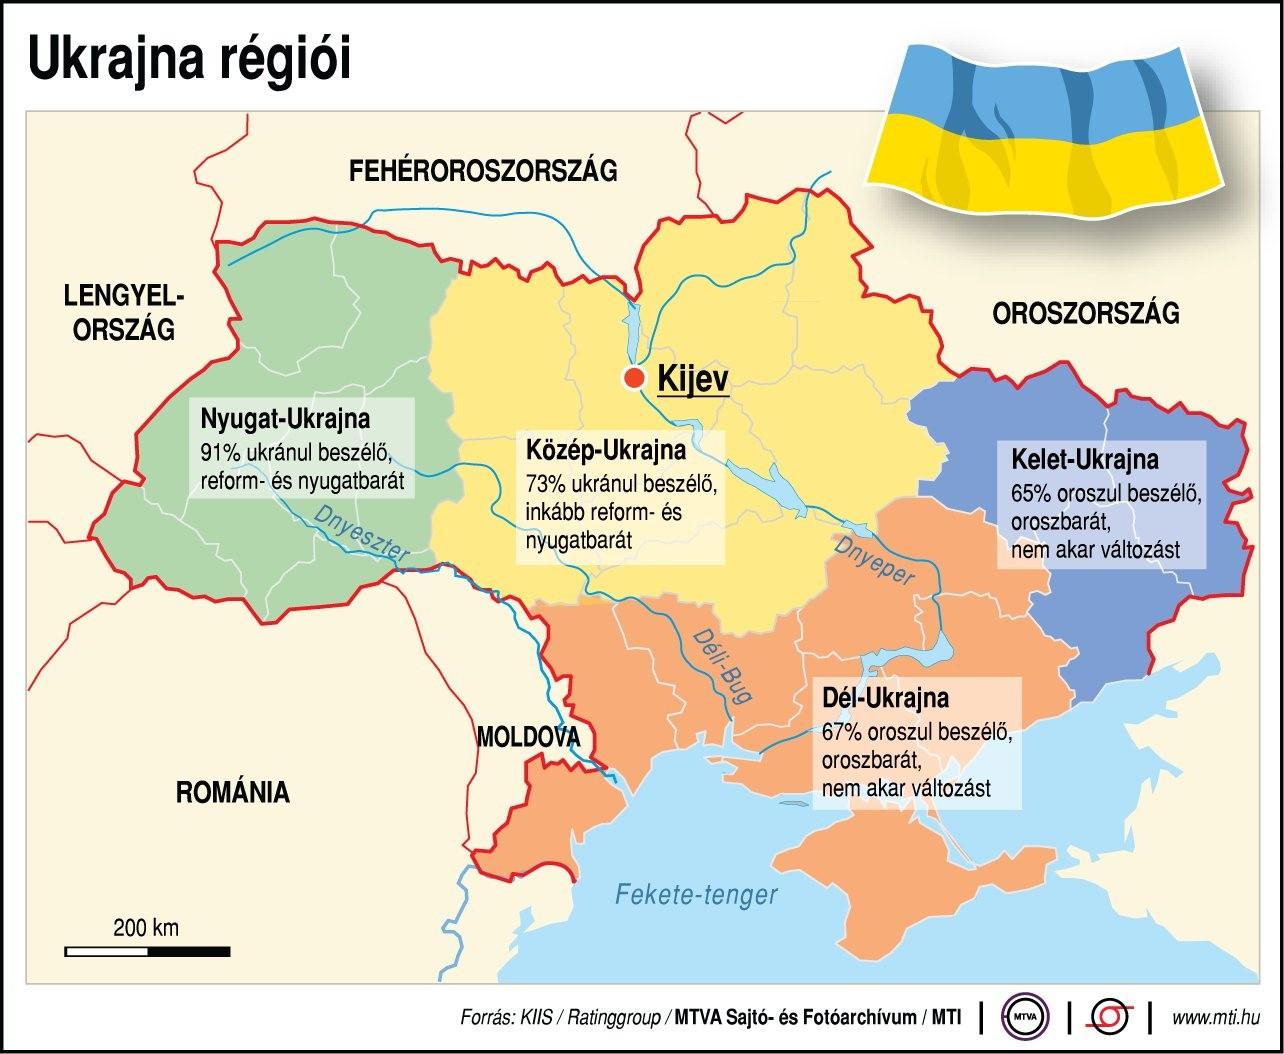 Ukrajna Regioi Foldrajz Magazin